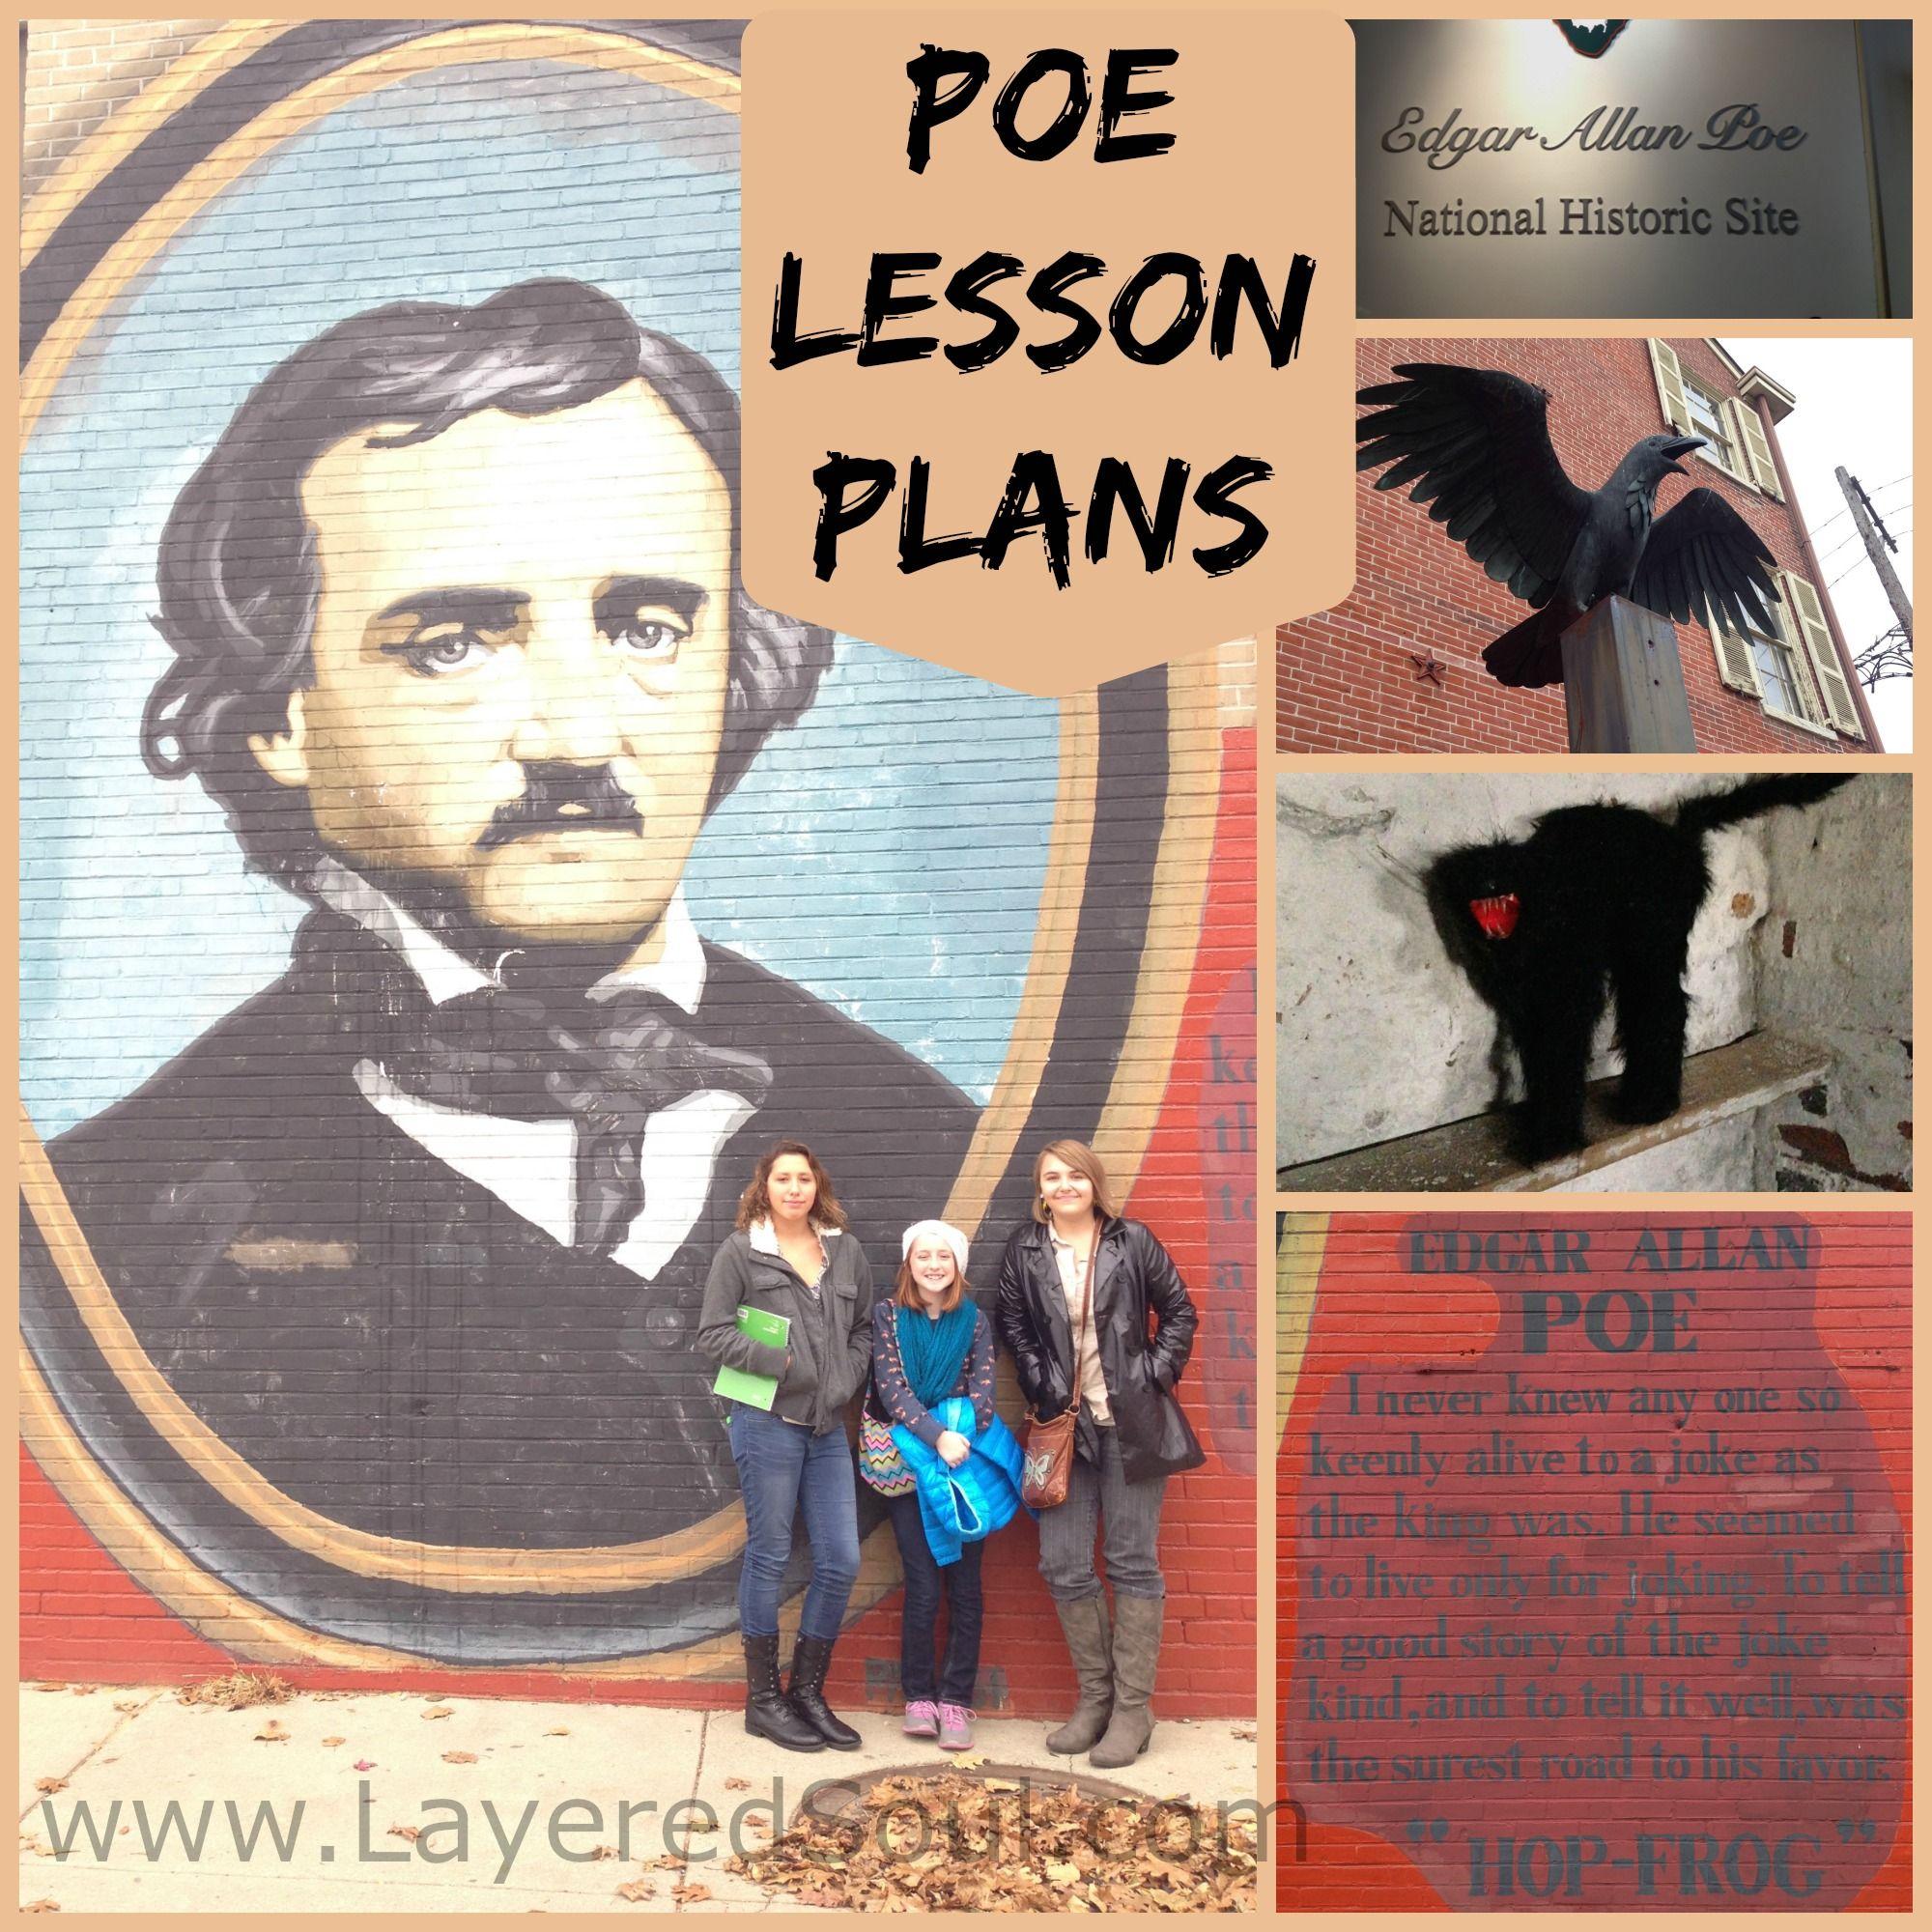 edgar allan poe lesson plans for high school